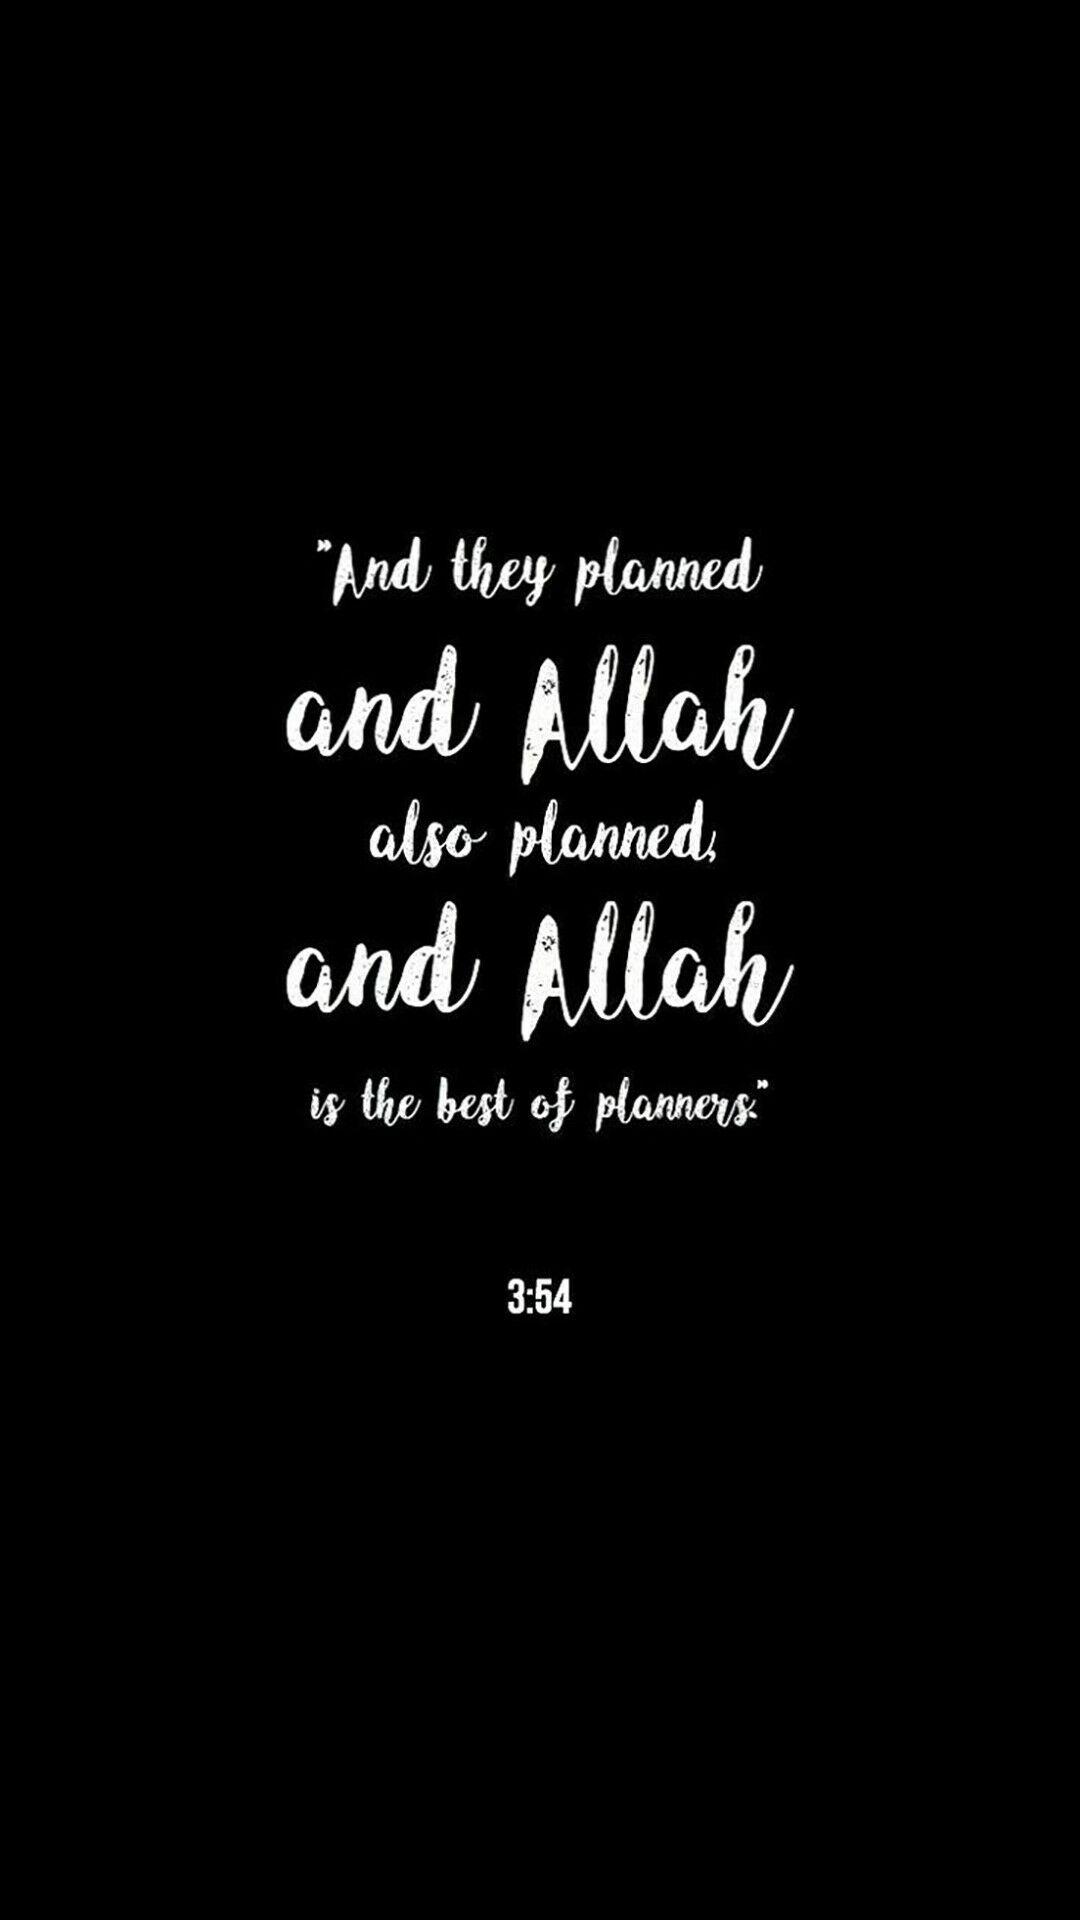 Motivational Quotes Wallpaper Android Kumpulan Wallpaper Islami Hd Keren Insya Allah Berkah